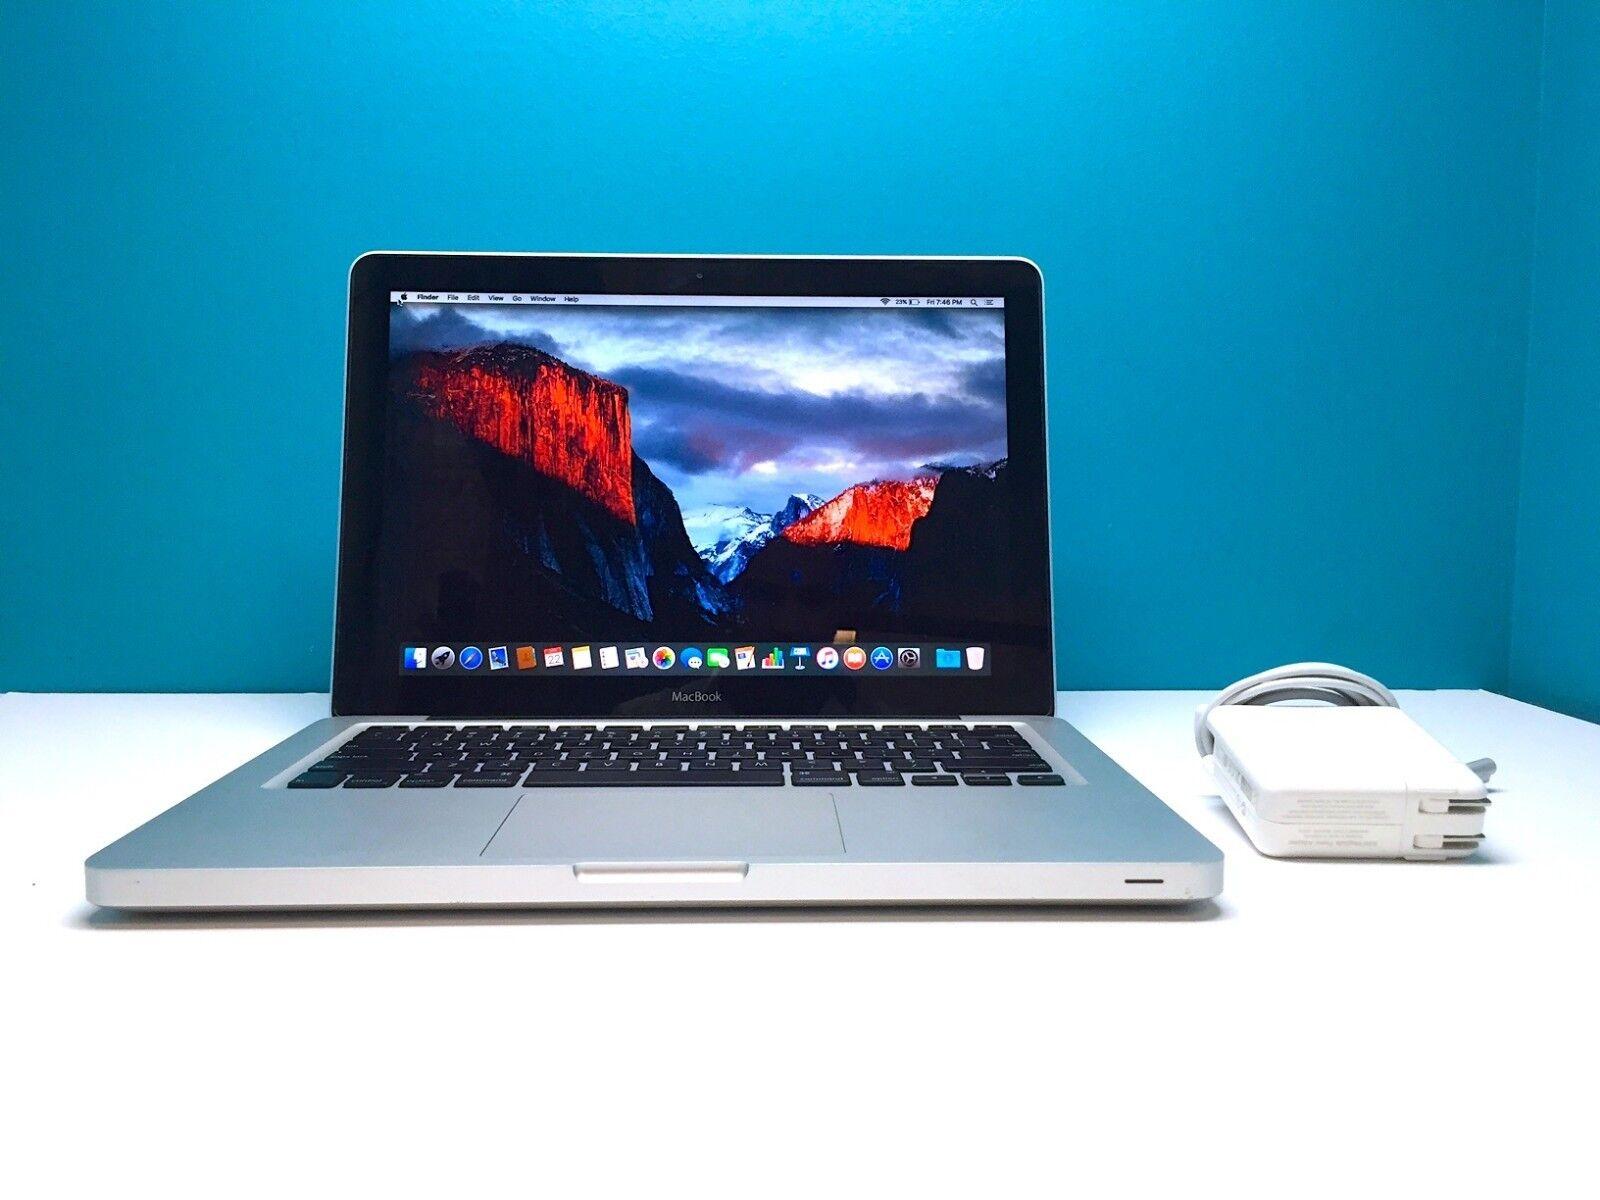 Apple MacBook Unibody 13 Inch Laptop Computer *BEST VALUE* OS-2017 - 1TB Storage